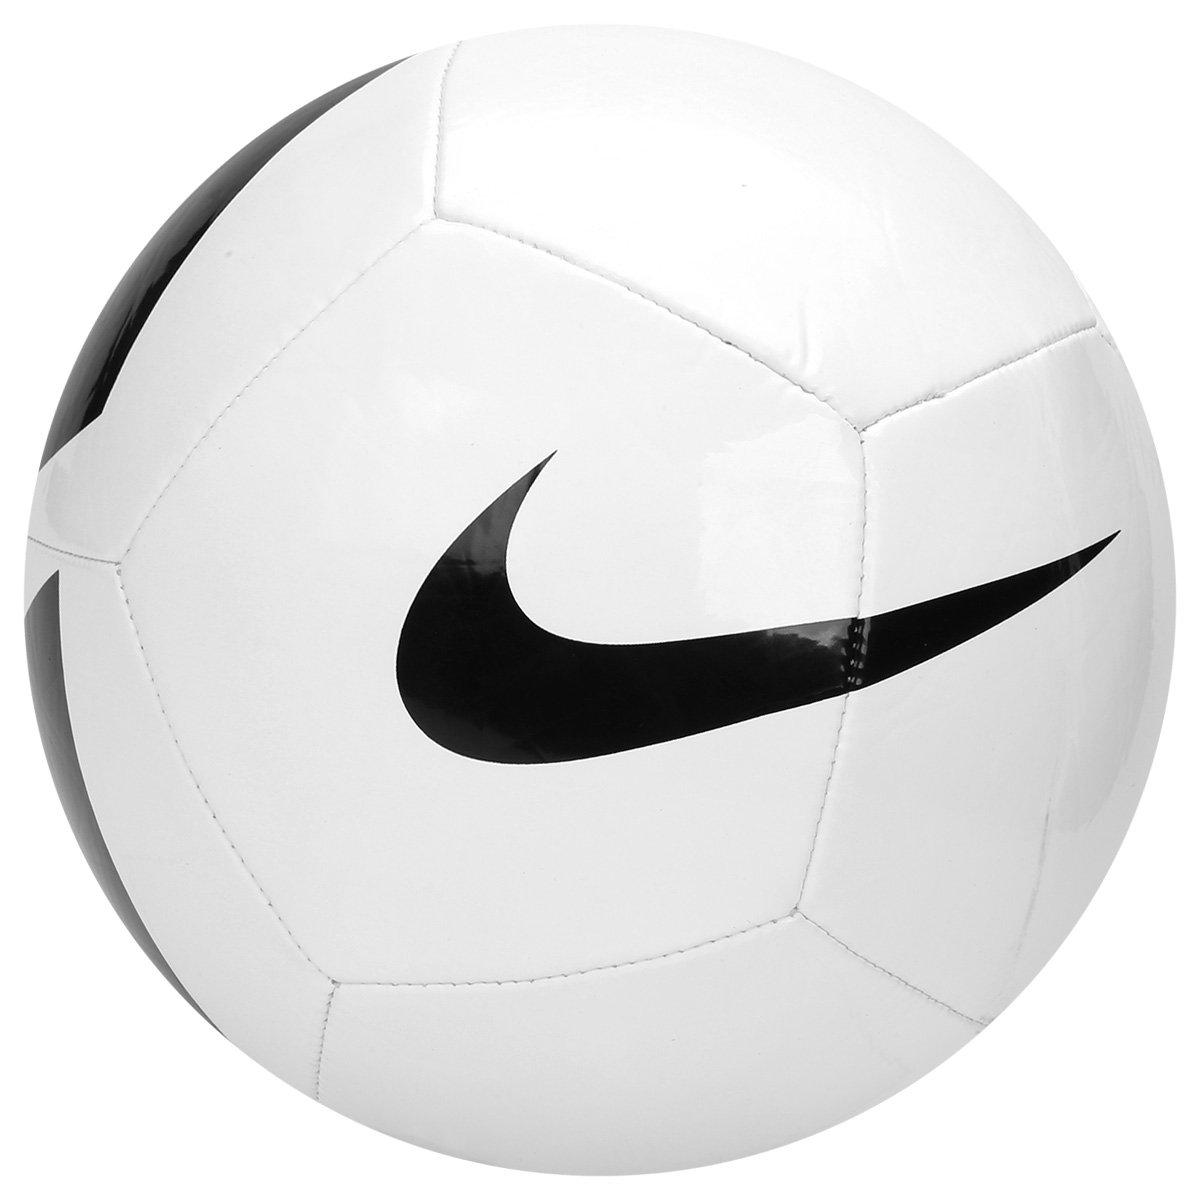 e50b5a0541 Bola Futebol Campo Nike Pich Team - Branco e Preto - Compre Agora ...